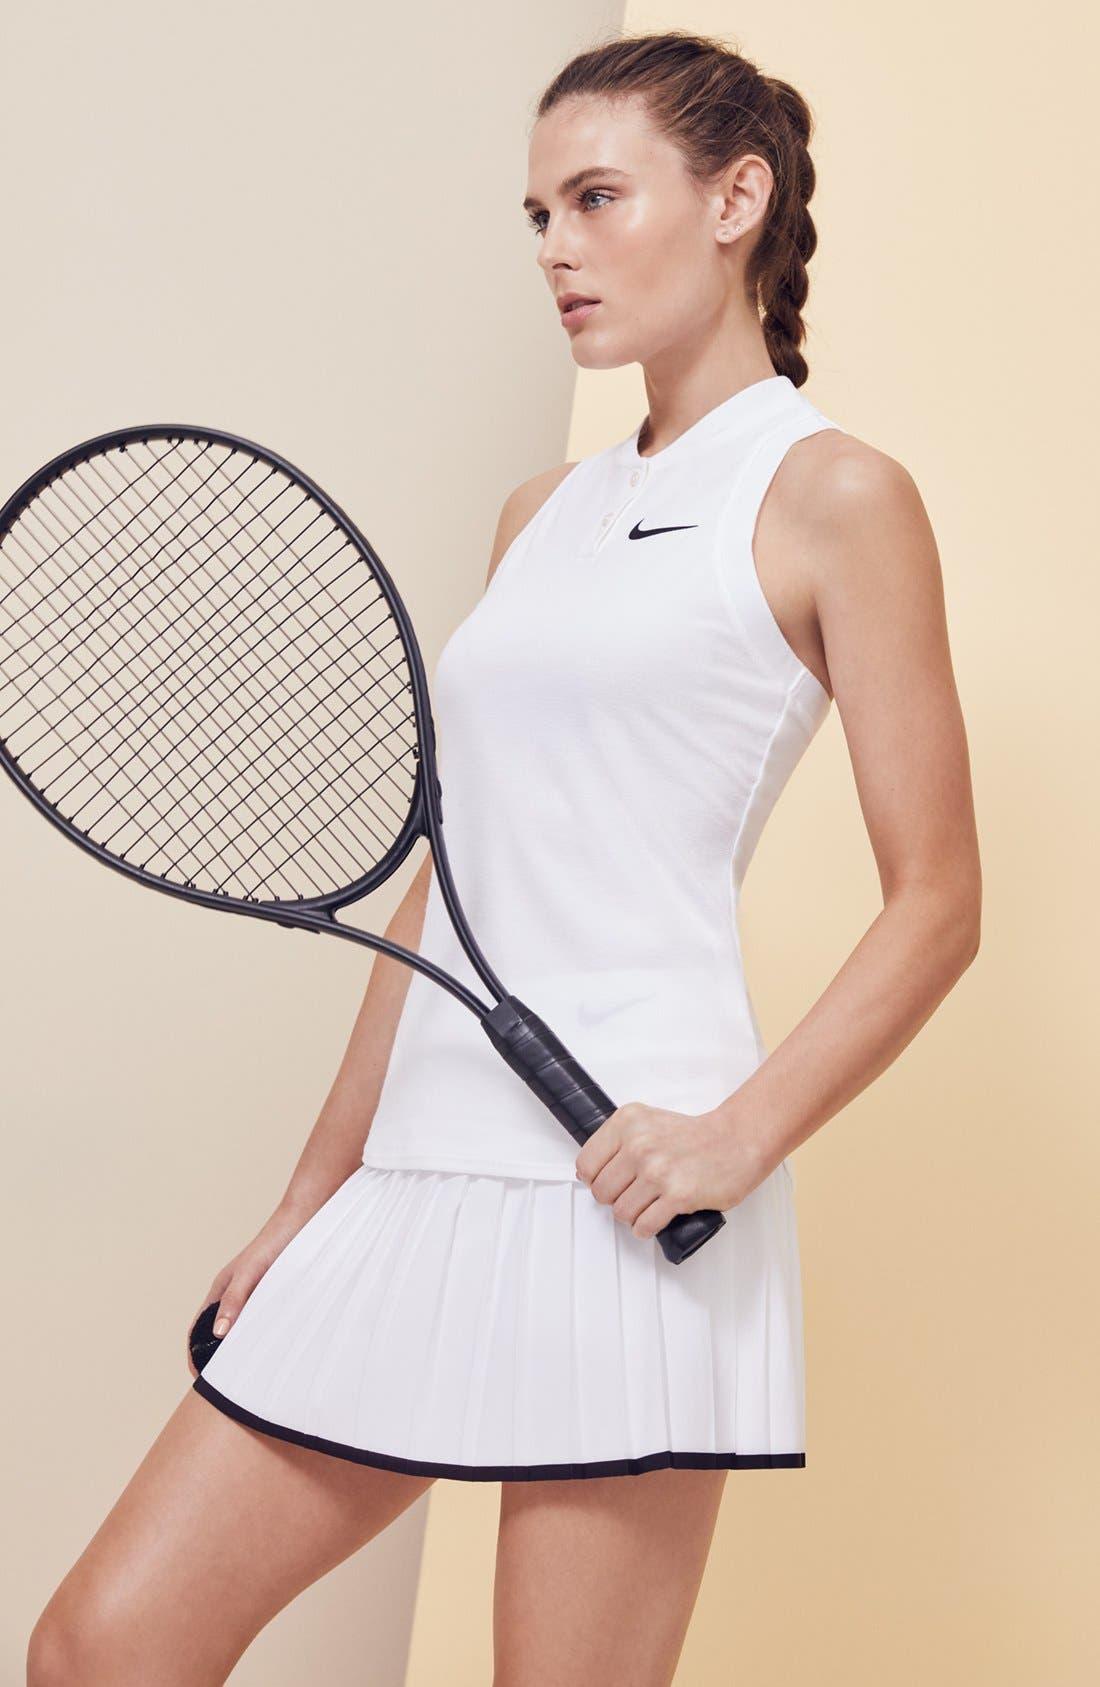 'Victory' Pleat Dri-FIT Tennis Skirt,                             Alternate thumbnail 8, color,